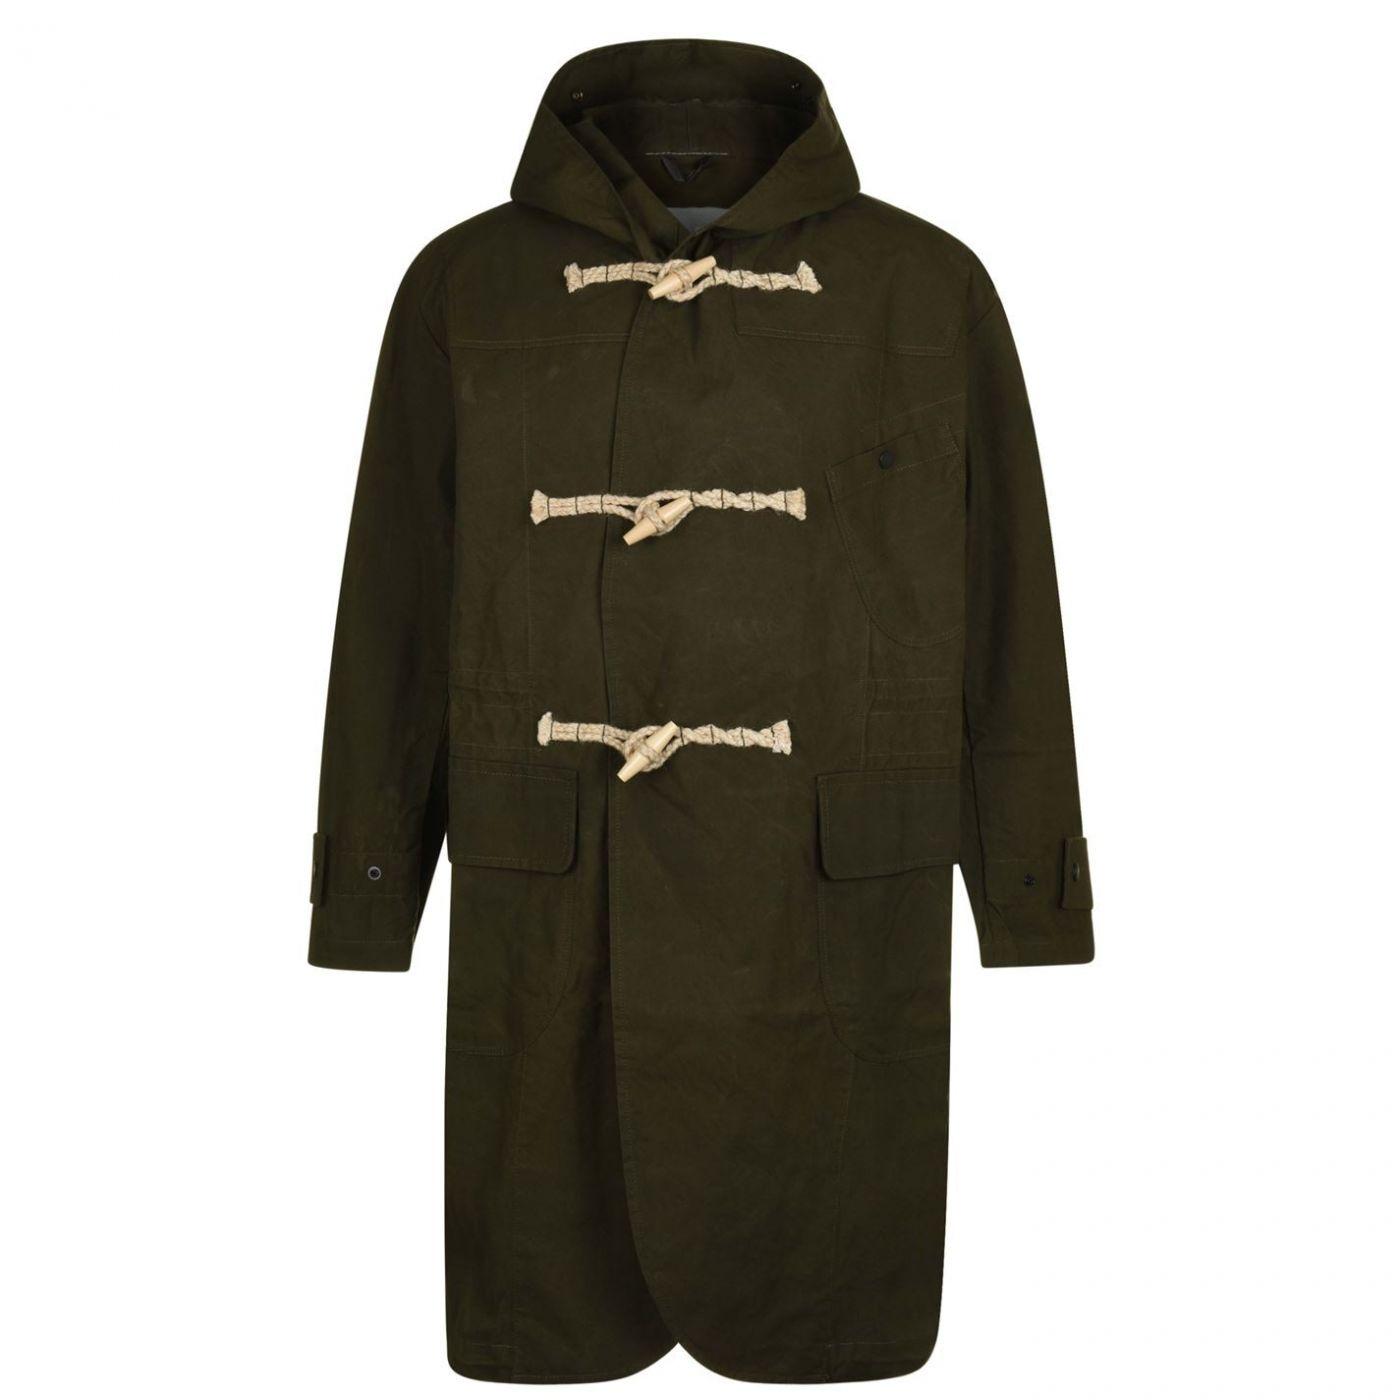 KARRIMOR ASPIRE JAPAN Wax Duffle Coat